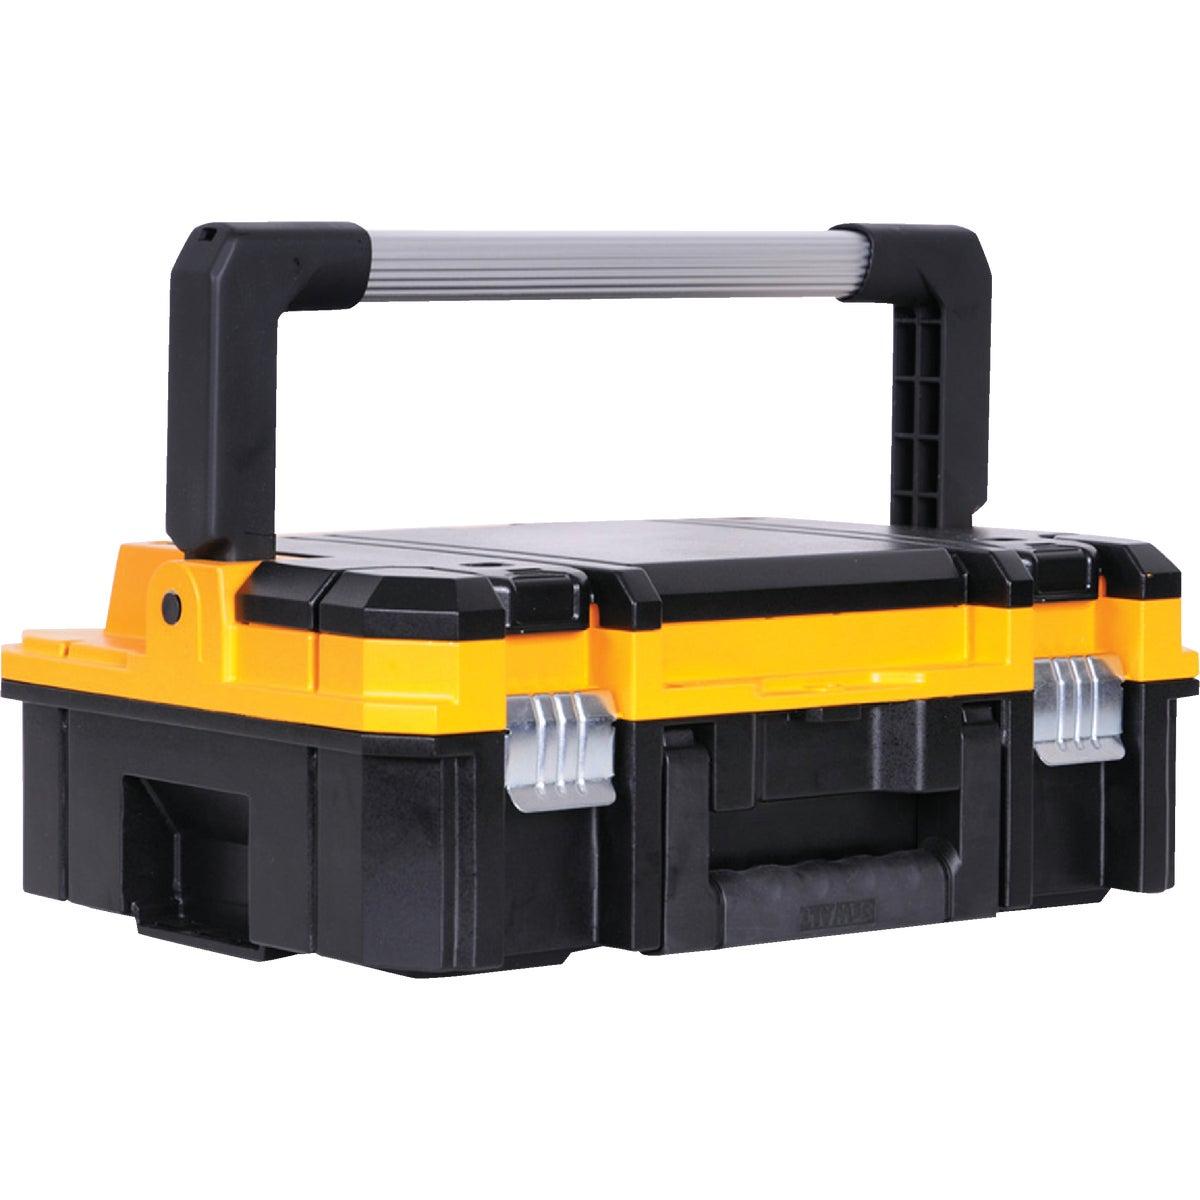 TSTAK CASE W/LNG HNDL - DWST17808 by Stanley Tools